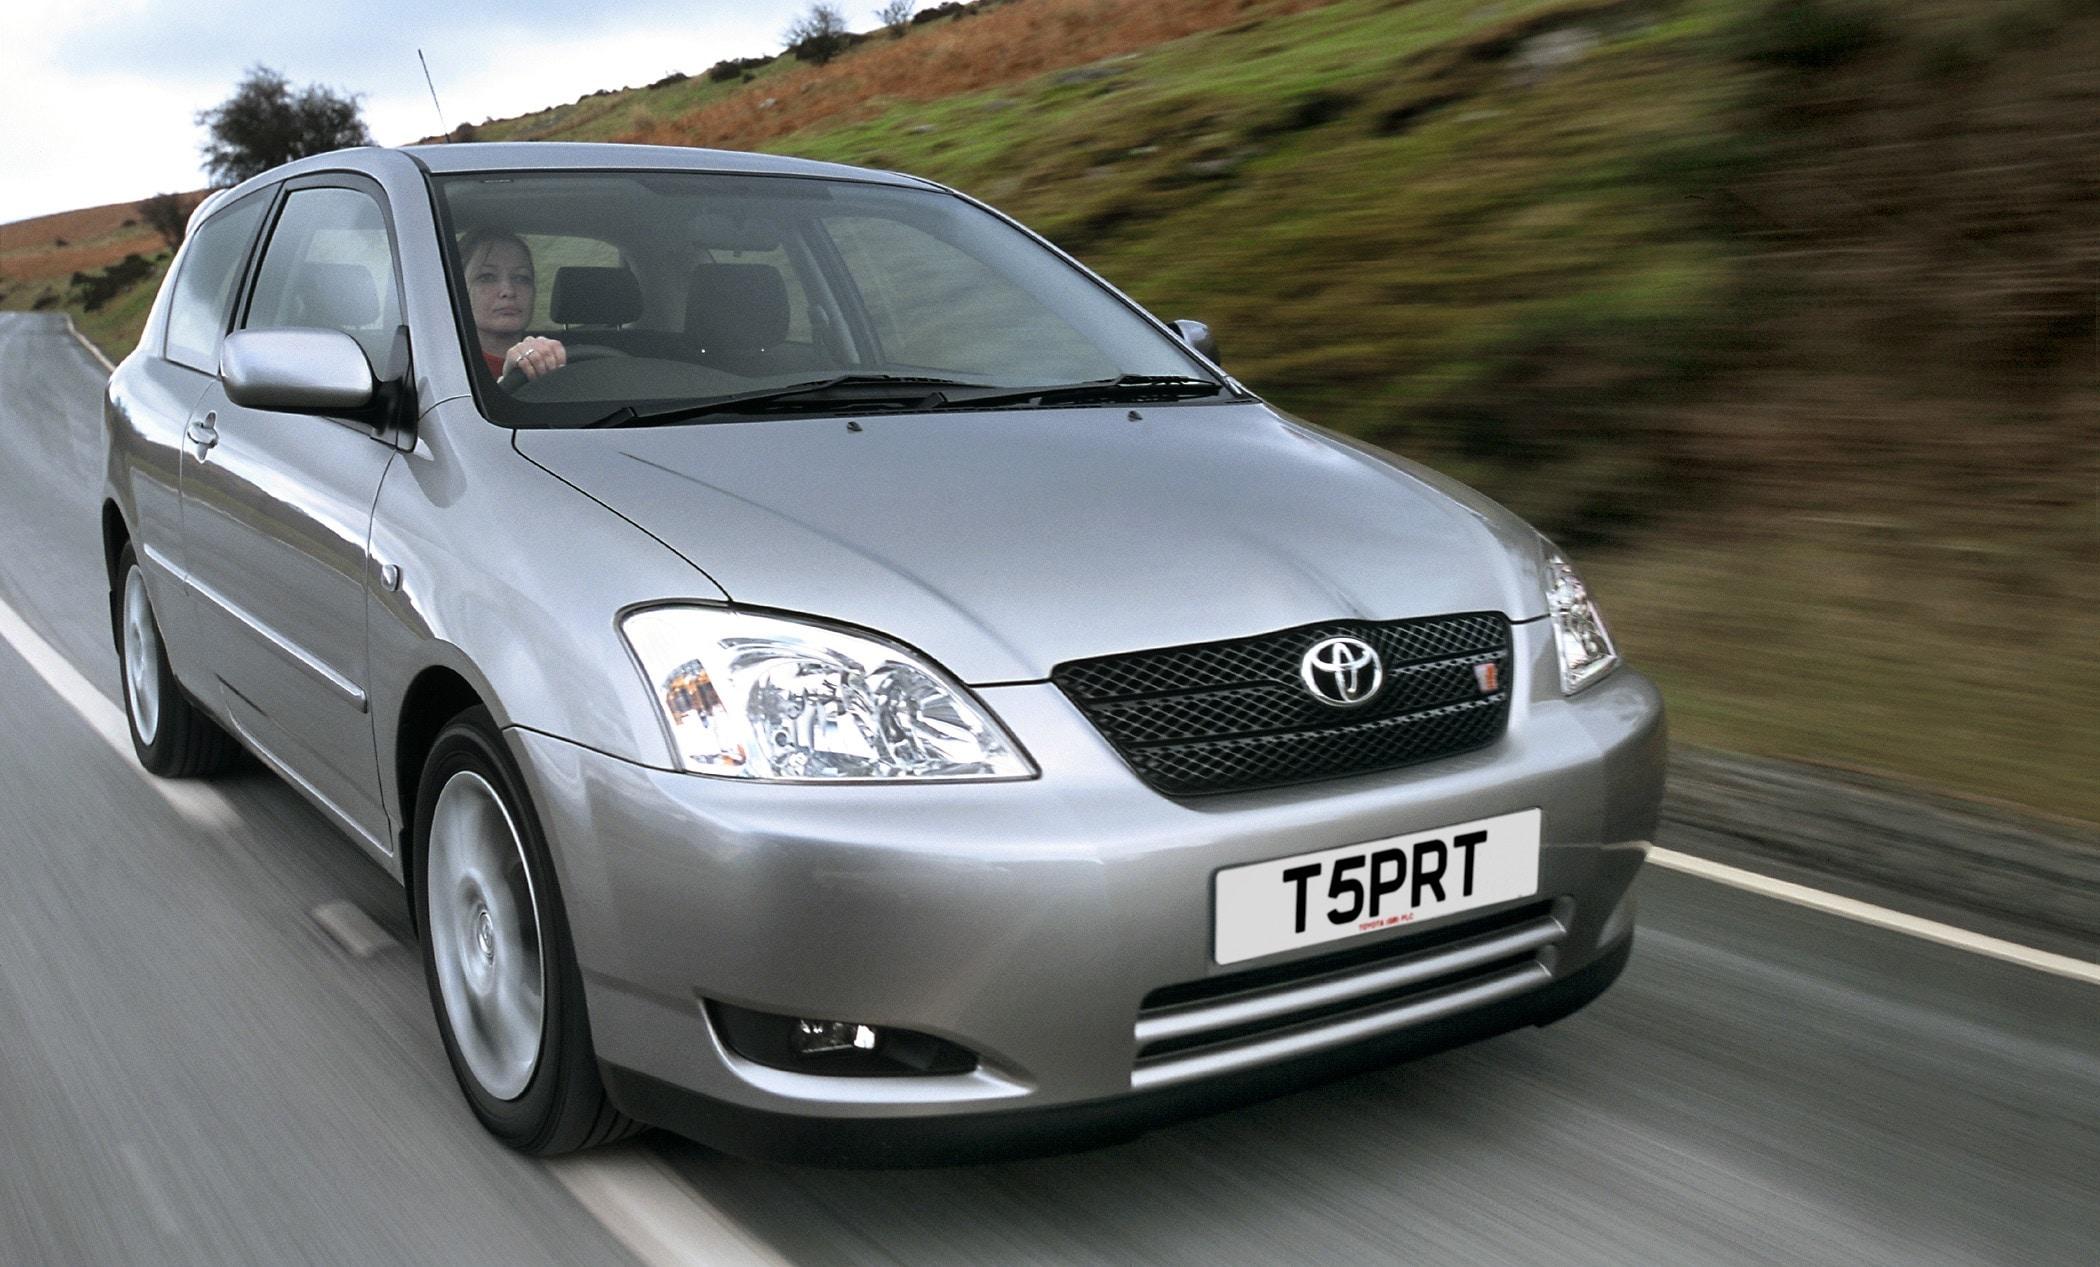 Toyota Corolla T Sport, Toyota Corolla, T Sport, Corolla T Sport, Toyota Corolla, japan, Japanese car, hatchback, hot hatch, Golf GTi, Focus, motoring, automotive, classic car, retro car, ebay motors, autotrader